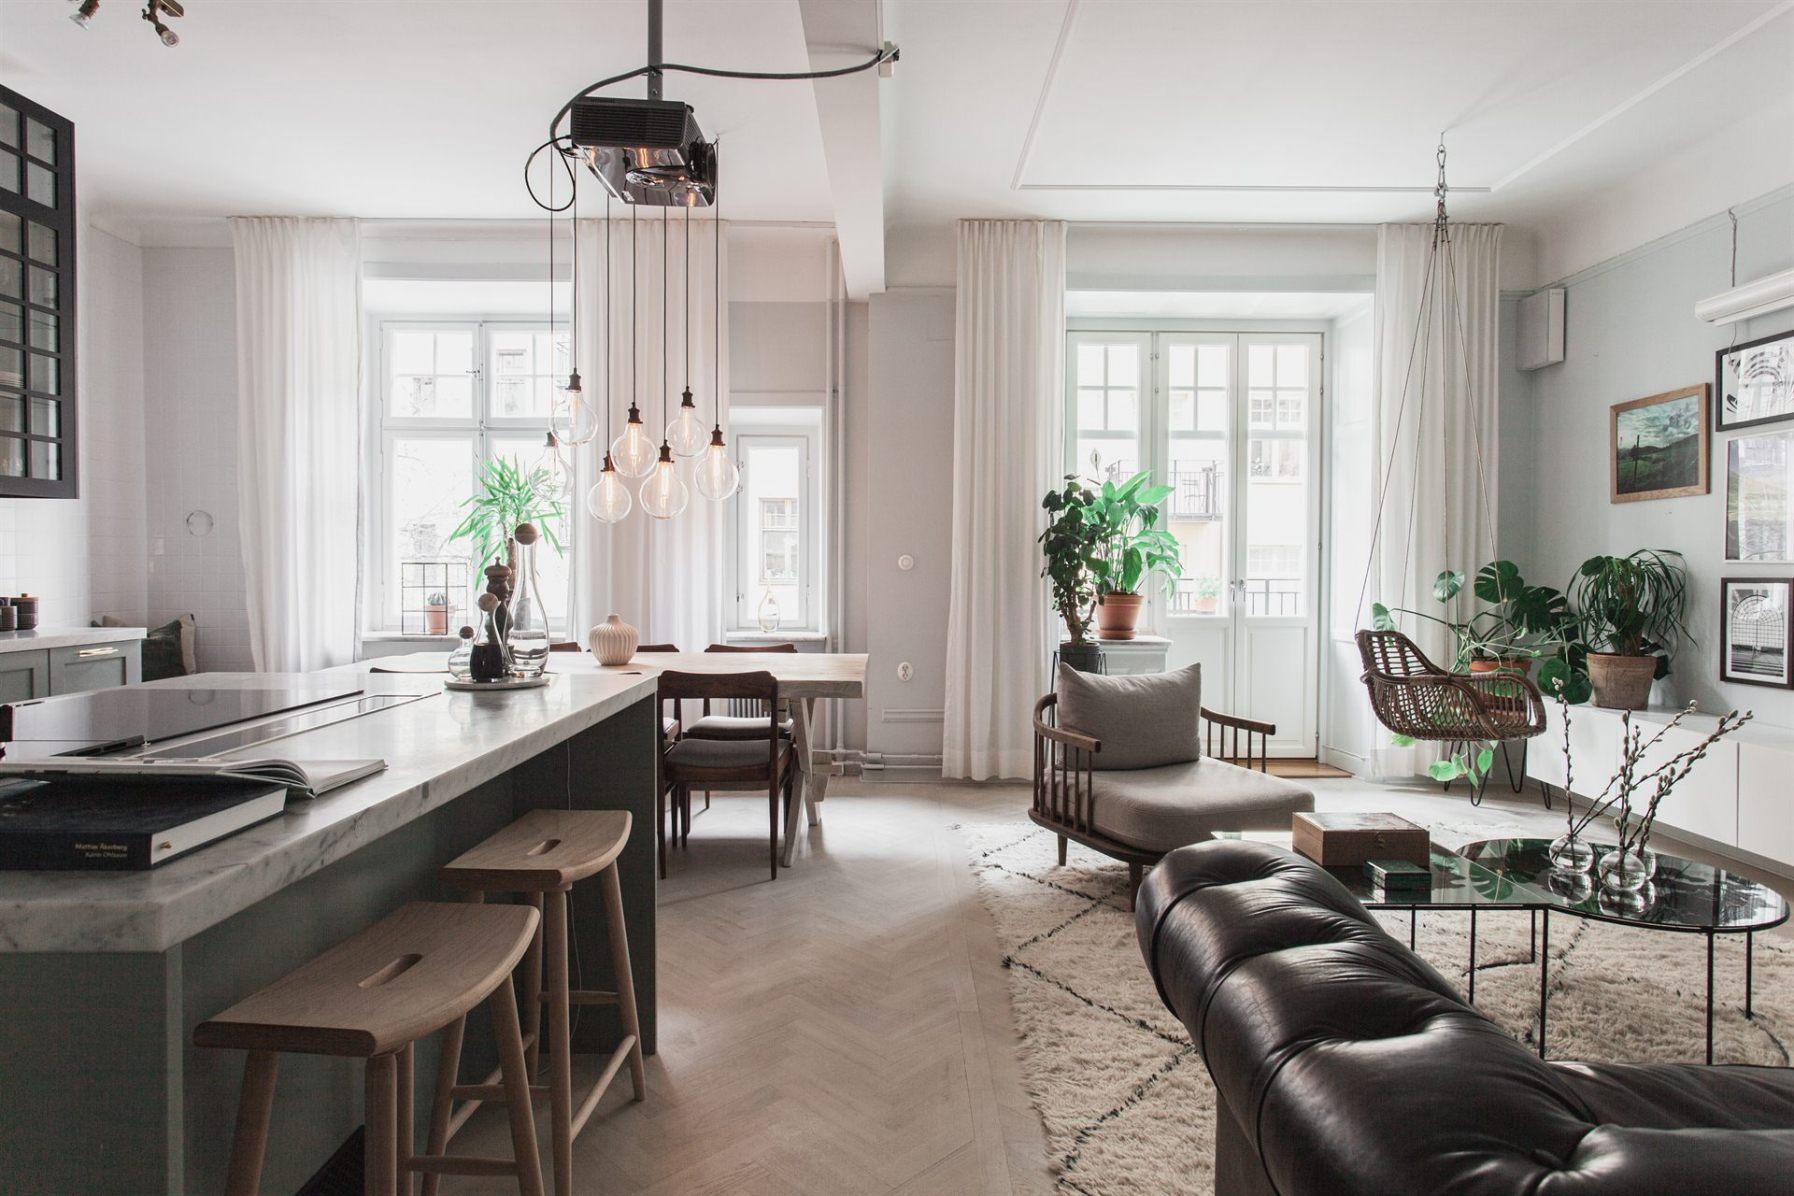 квартира 67 квм кухня гостиная